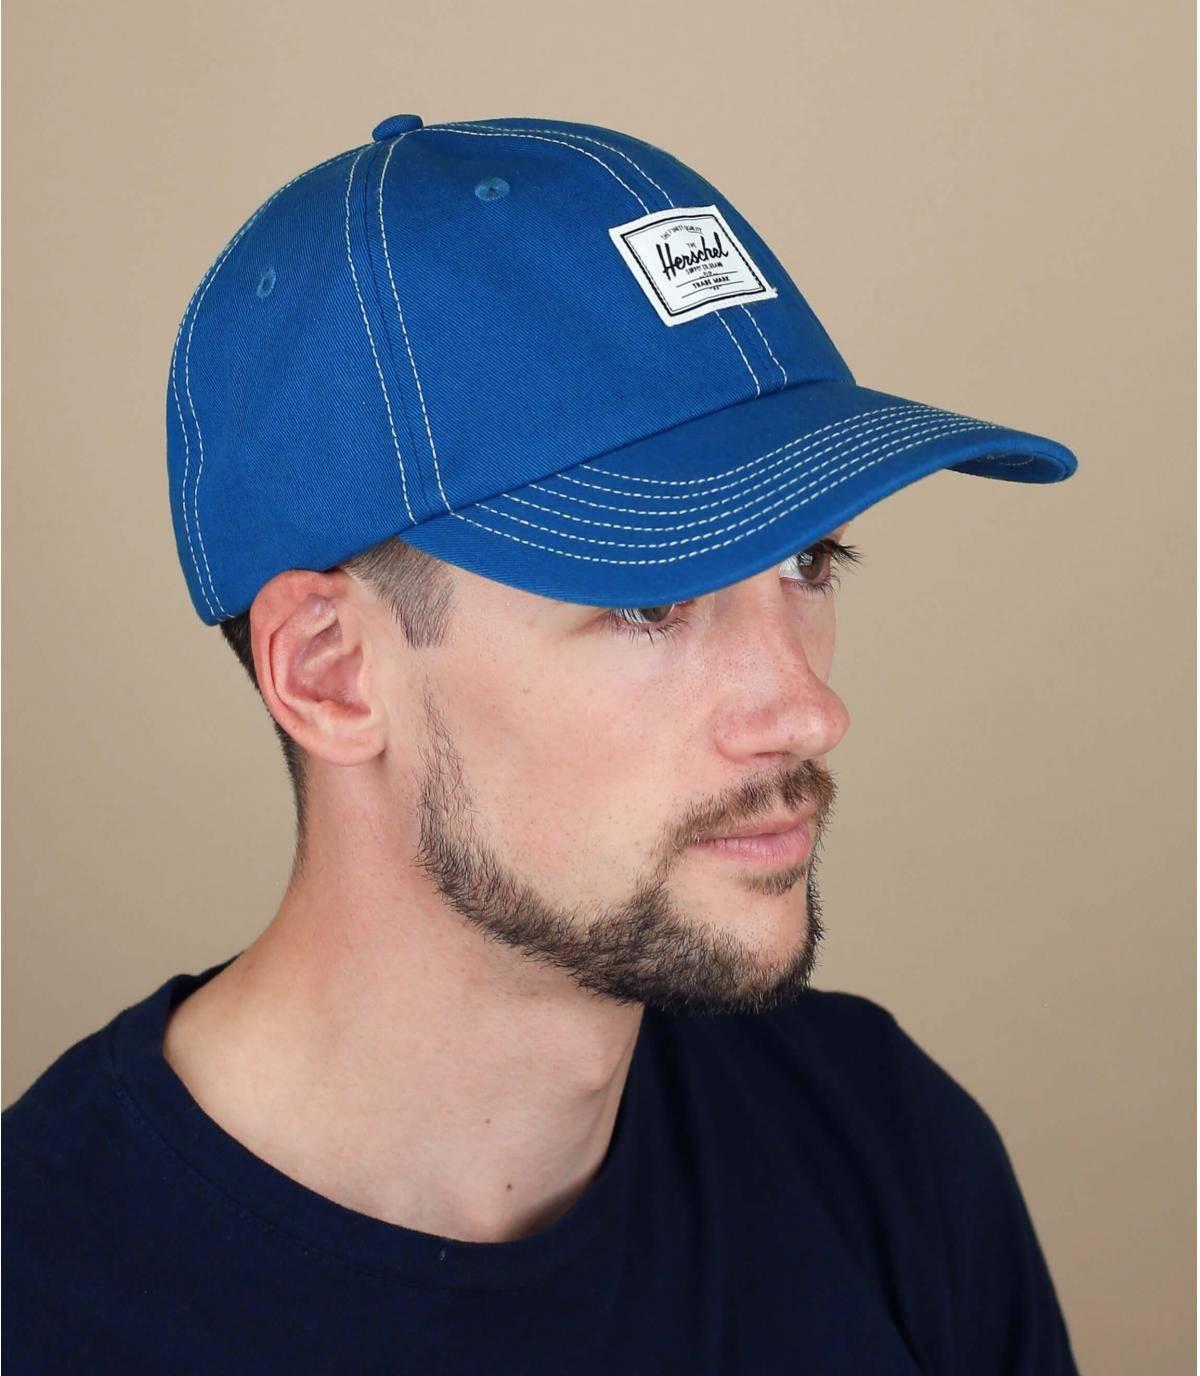 Gorra Herschel azul